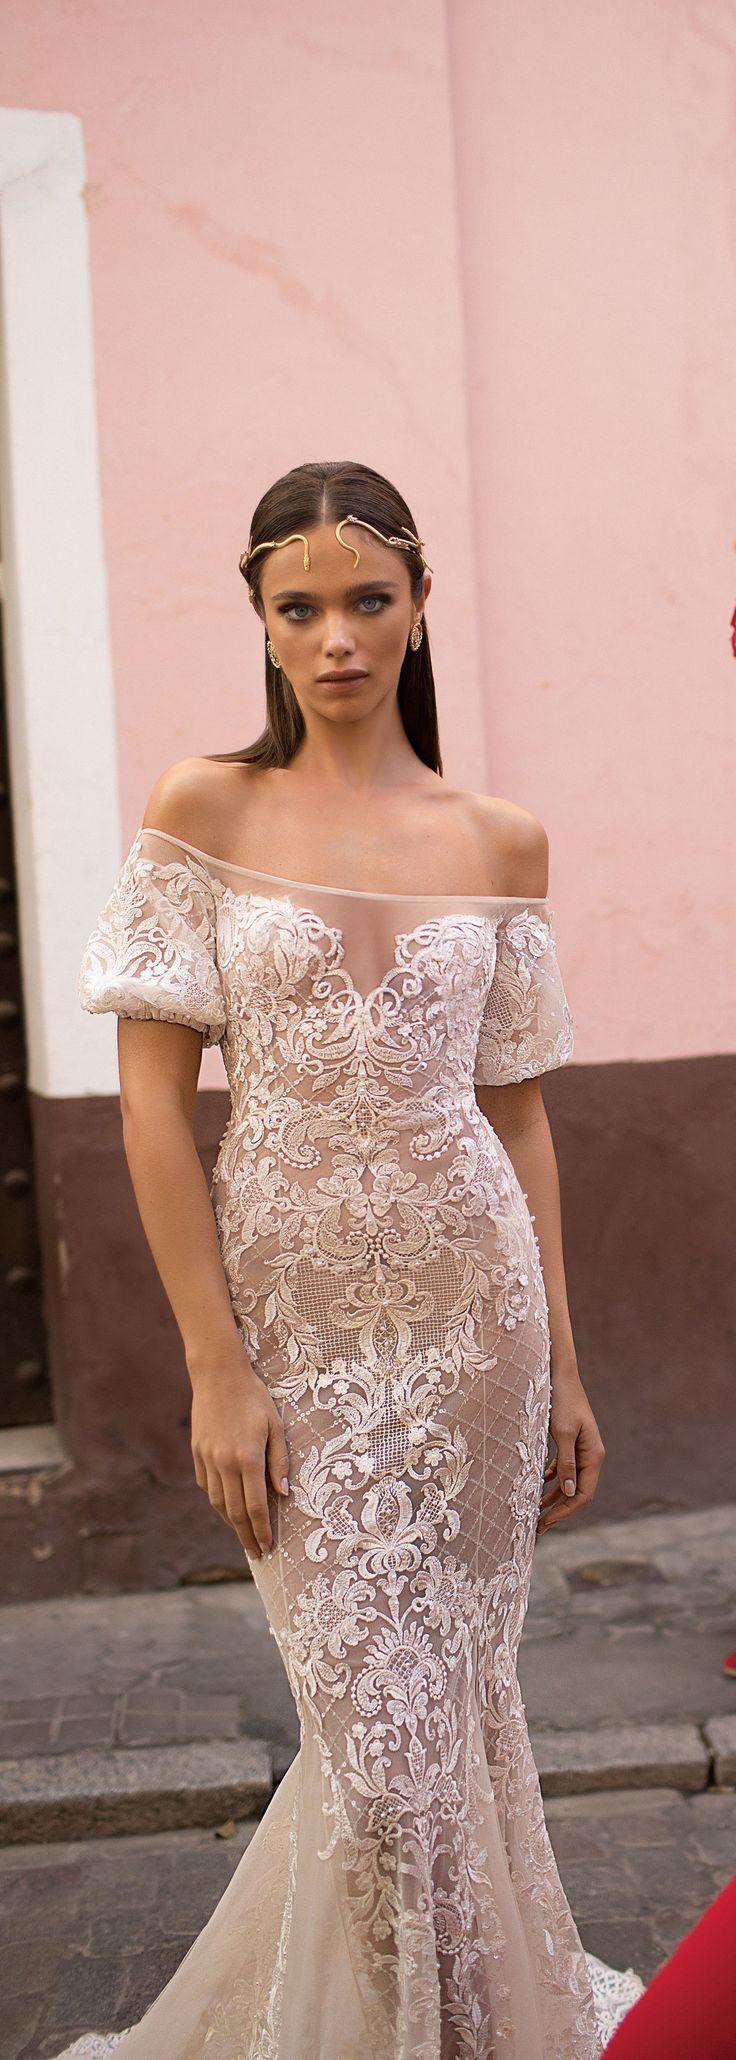 386 best Wedding Dress images on Pinterest | Wedding frocks, Bridal ...